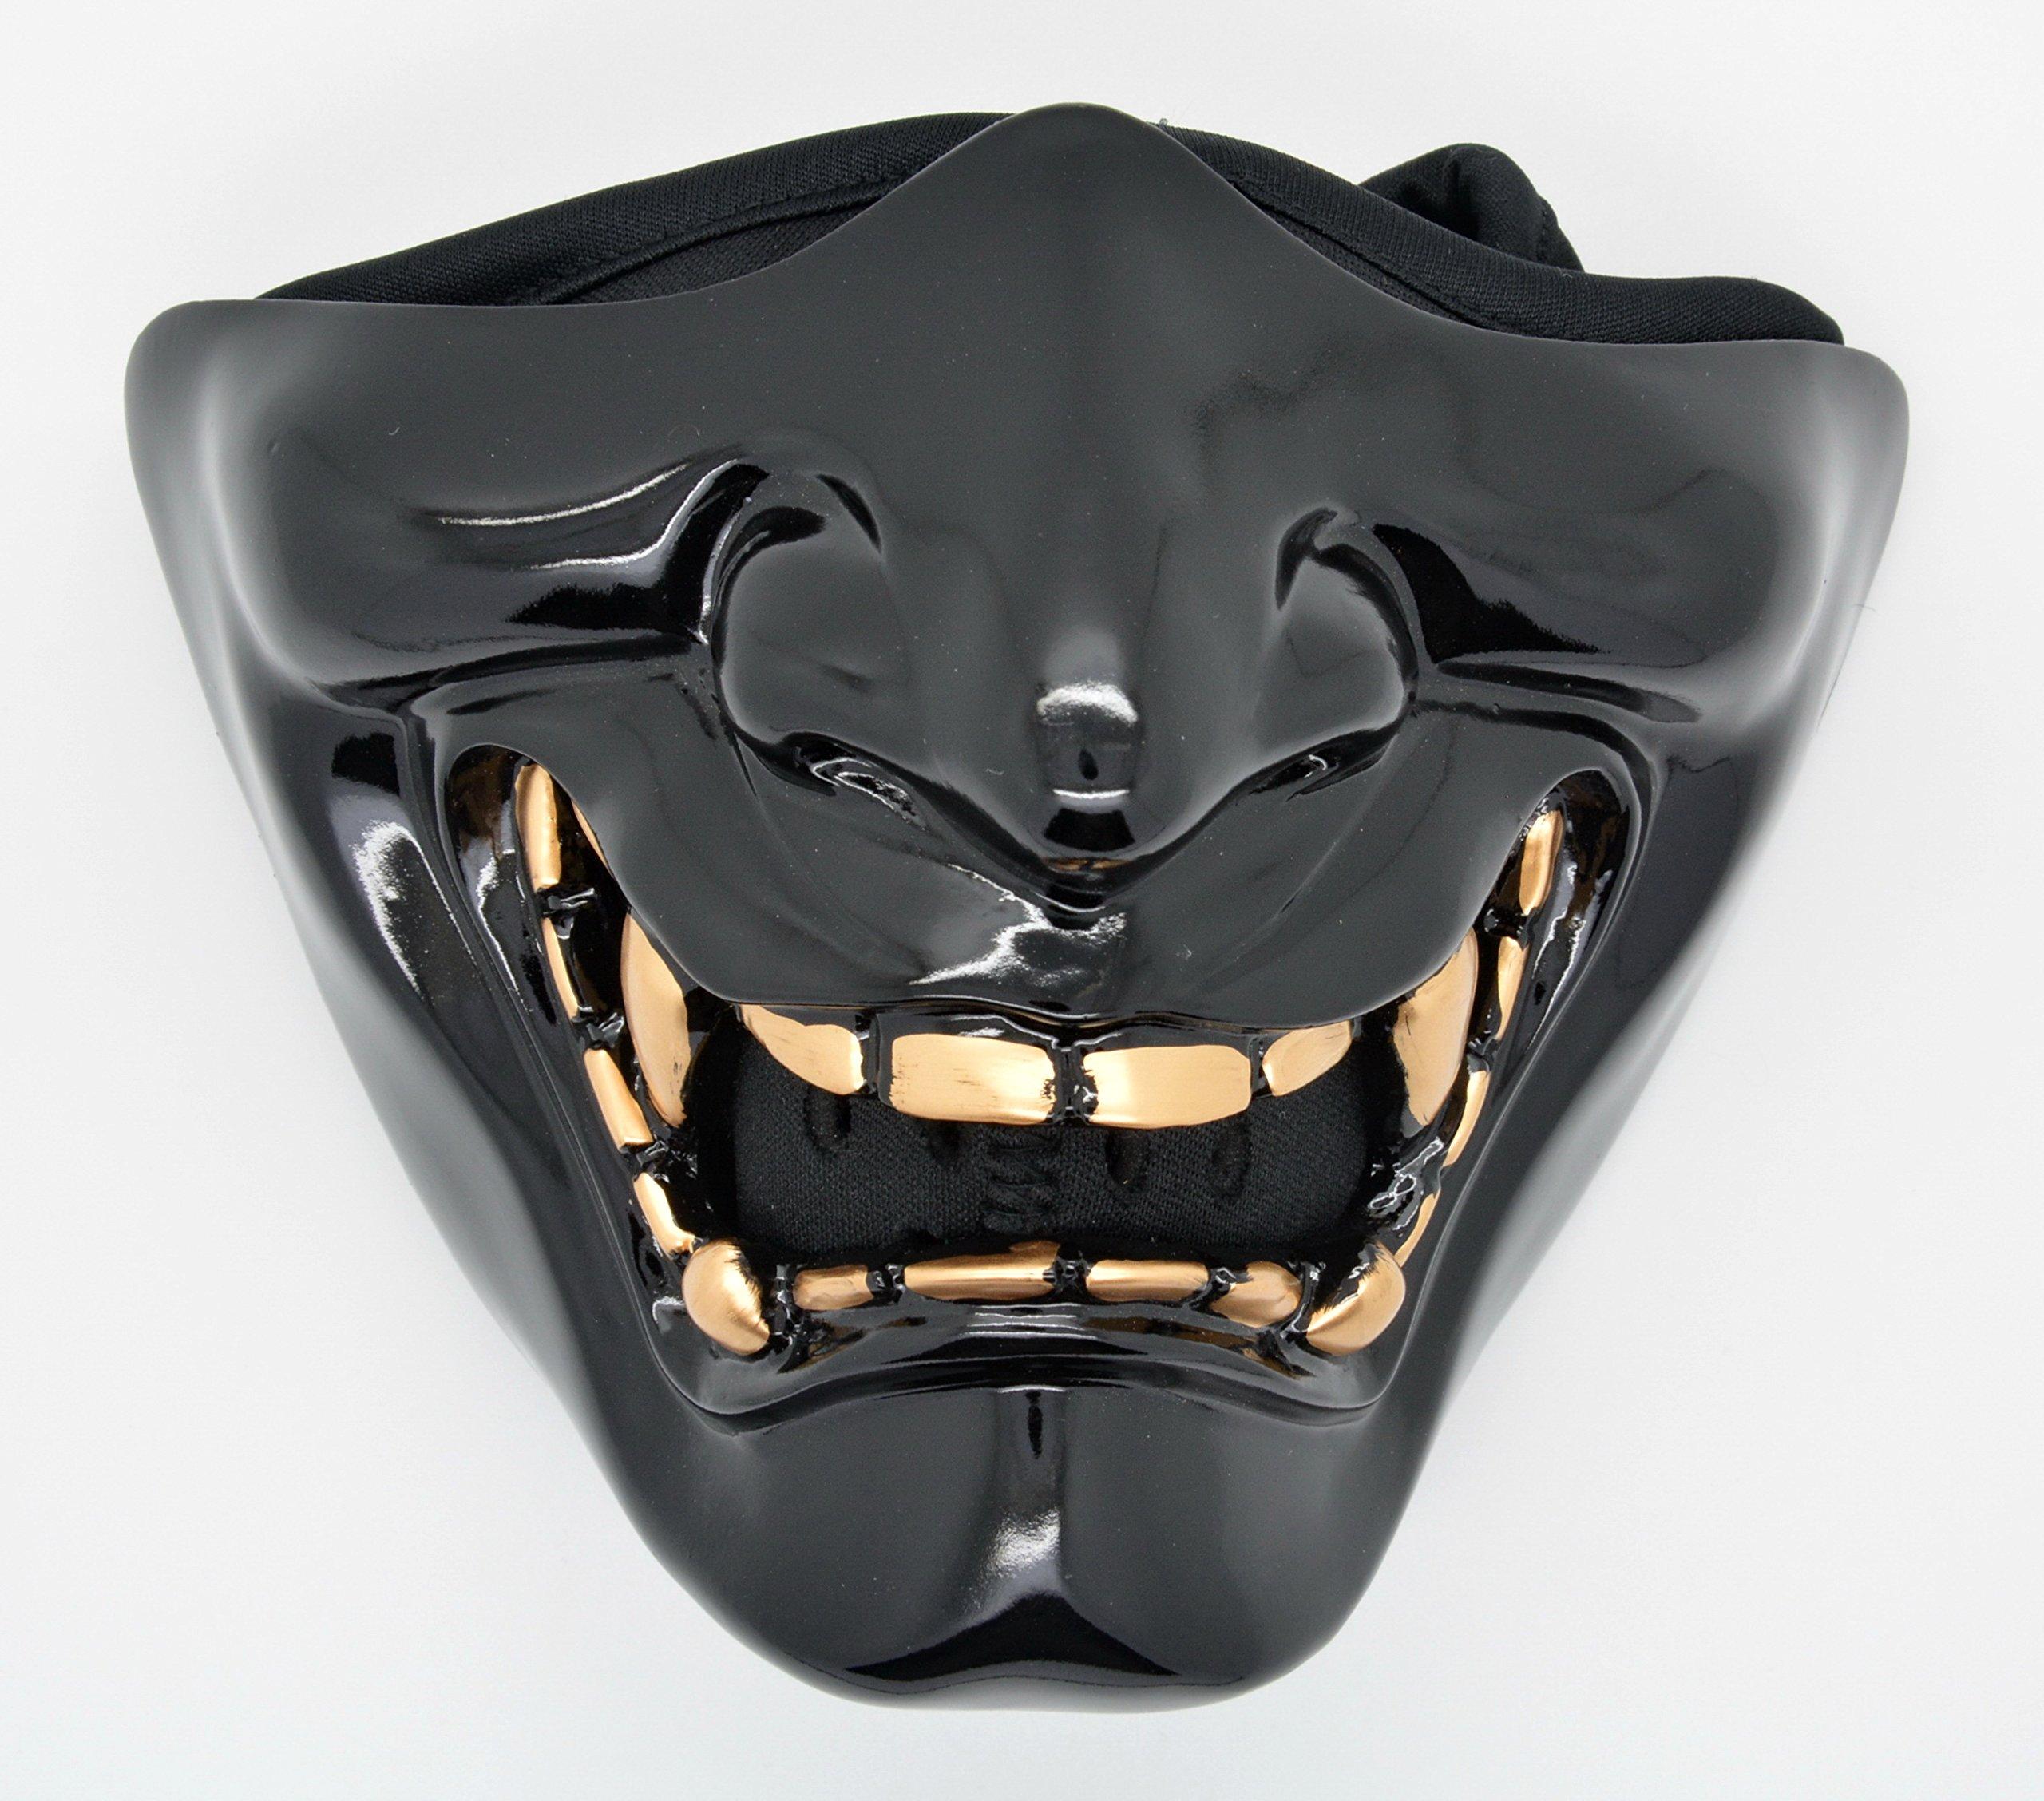 Samurai Half Face Mask Filter Motorcycle Biker Cycling Ski Snowboard Winter